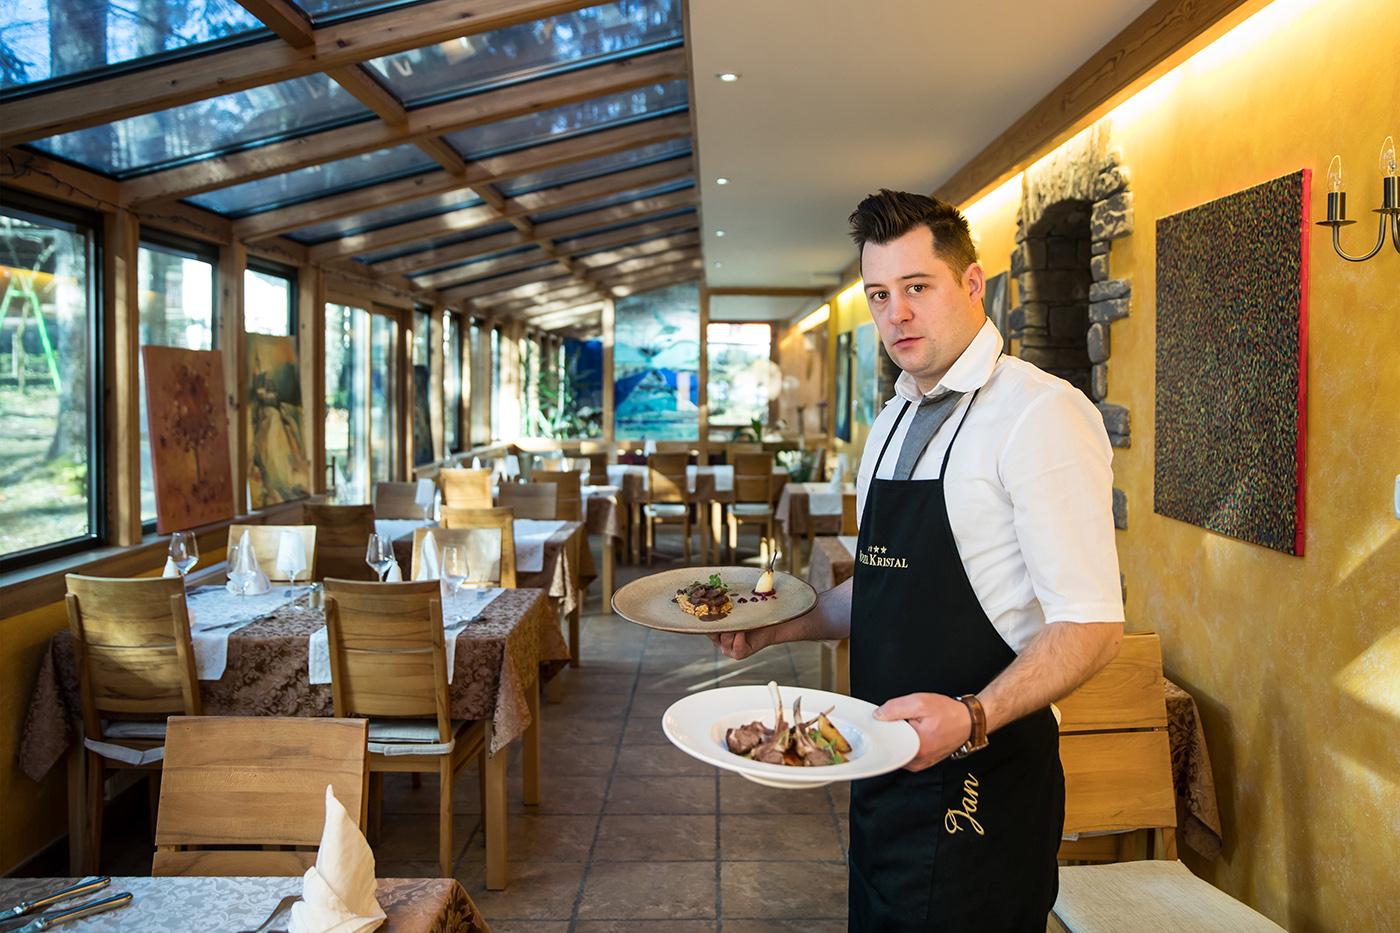 kristal_hotel_etterem_fine_dining